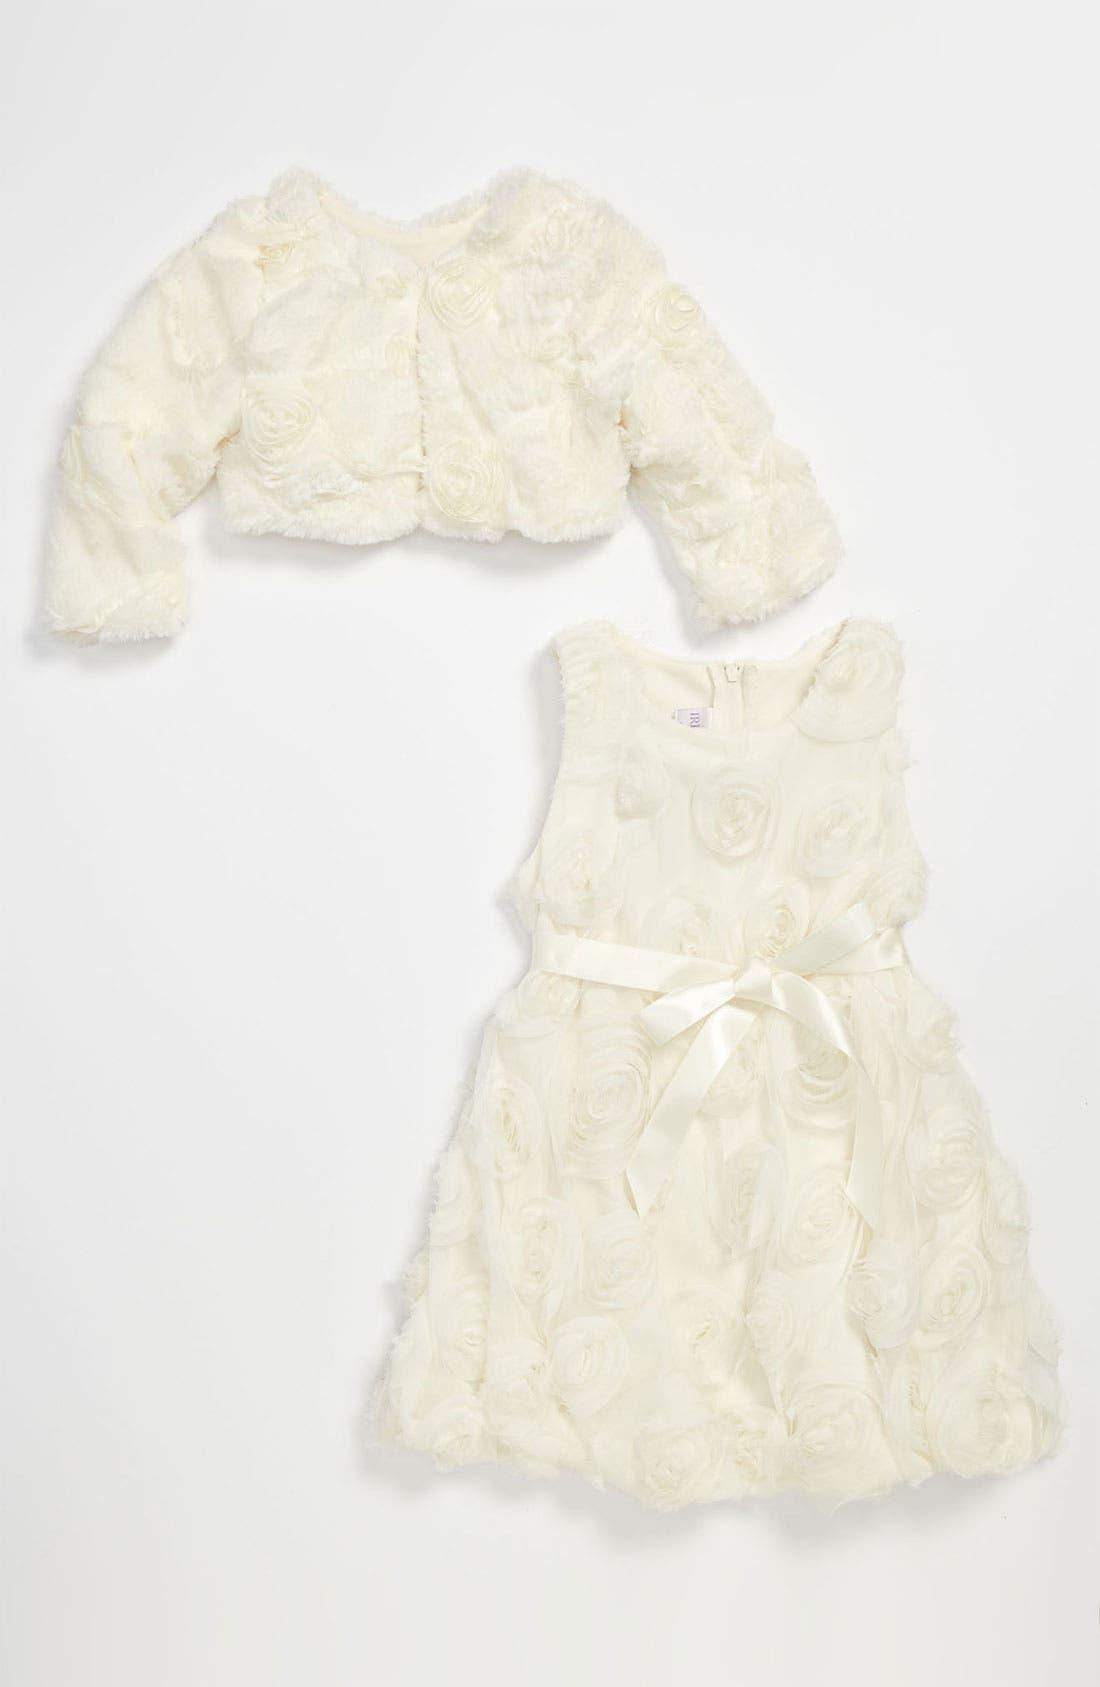 Main Image - Iris & Ivy Rosette Dress & Faux Fur Bolero (Toddler)